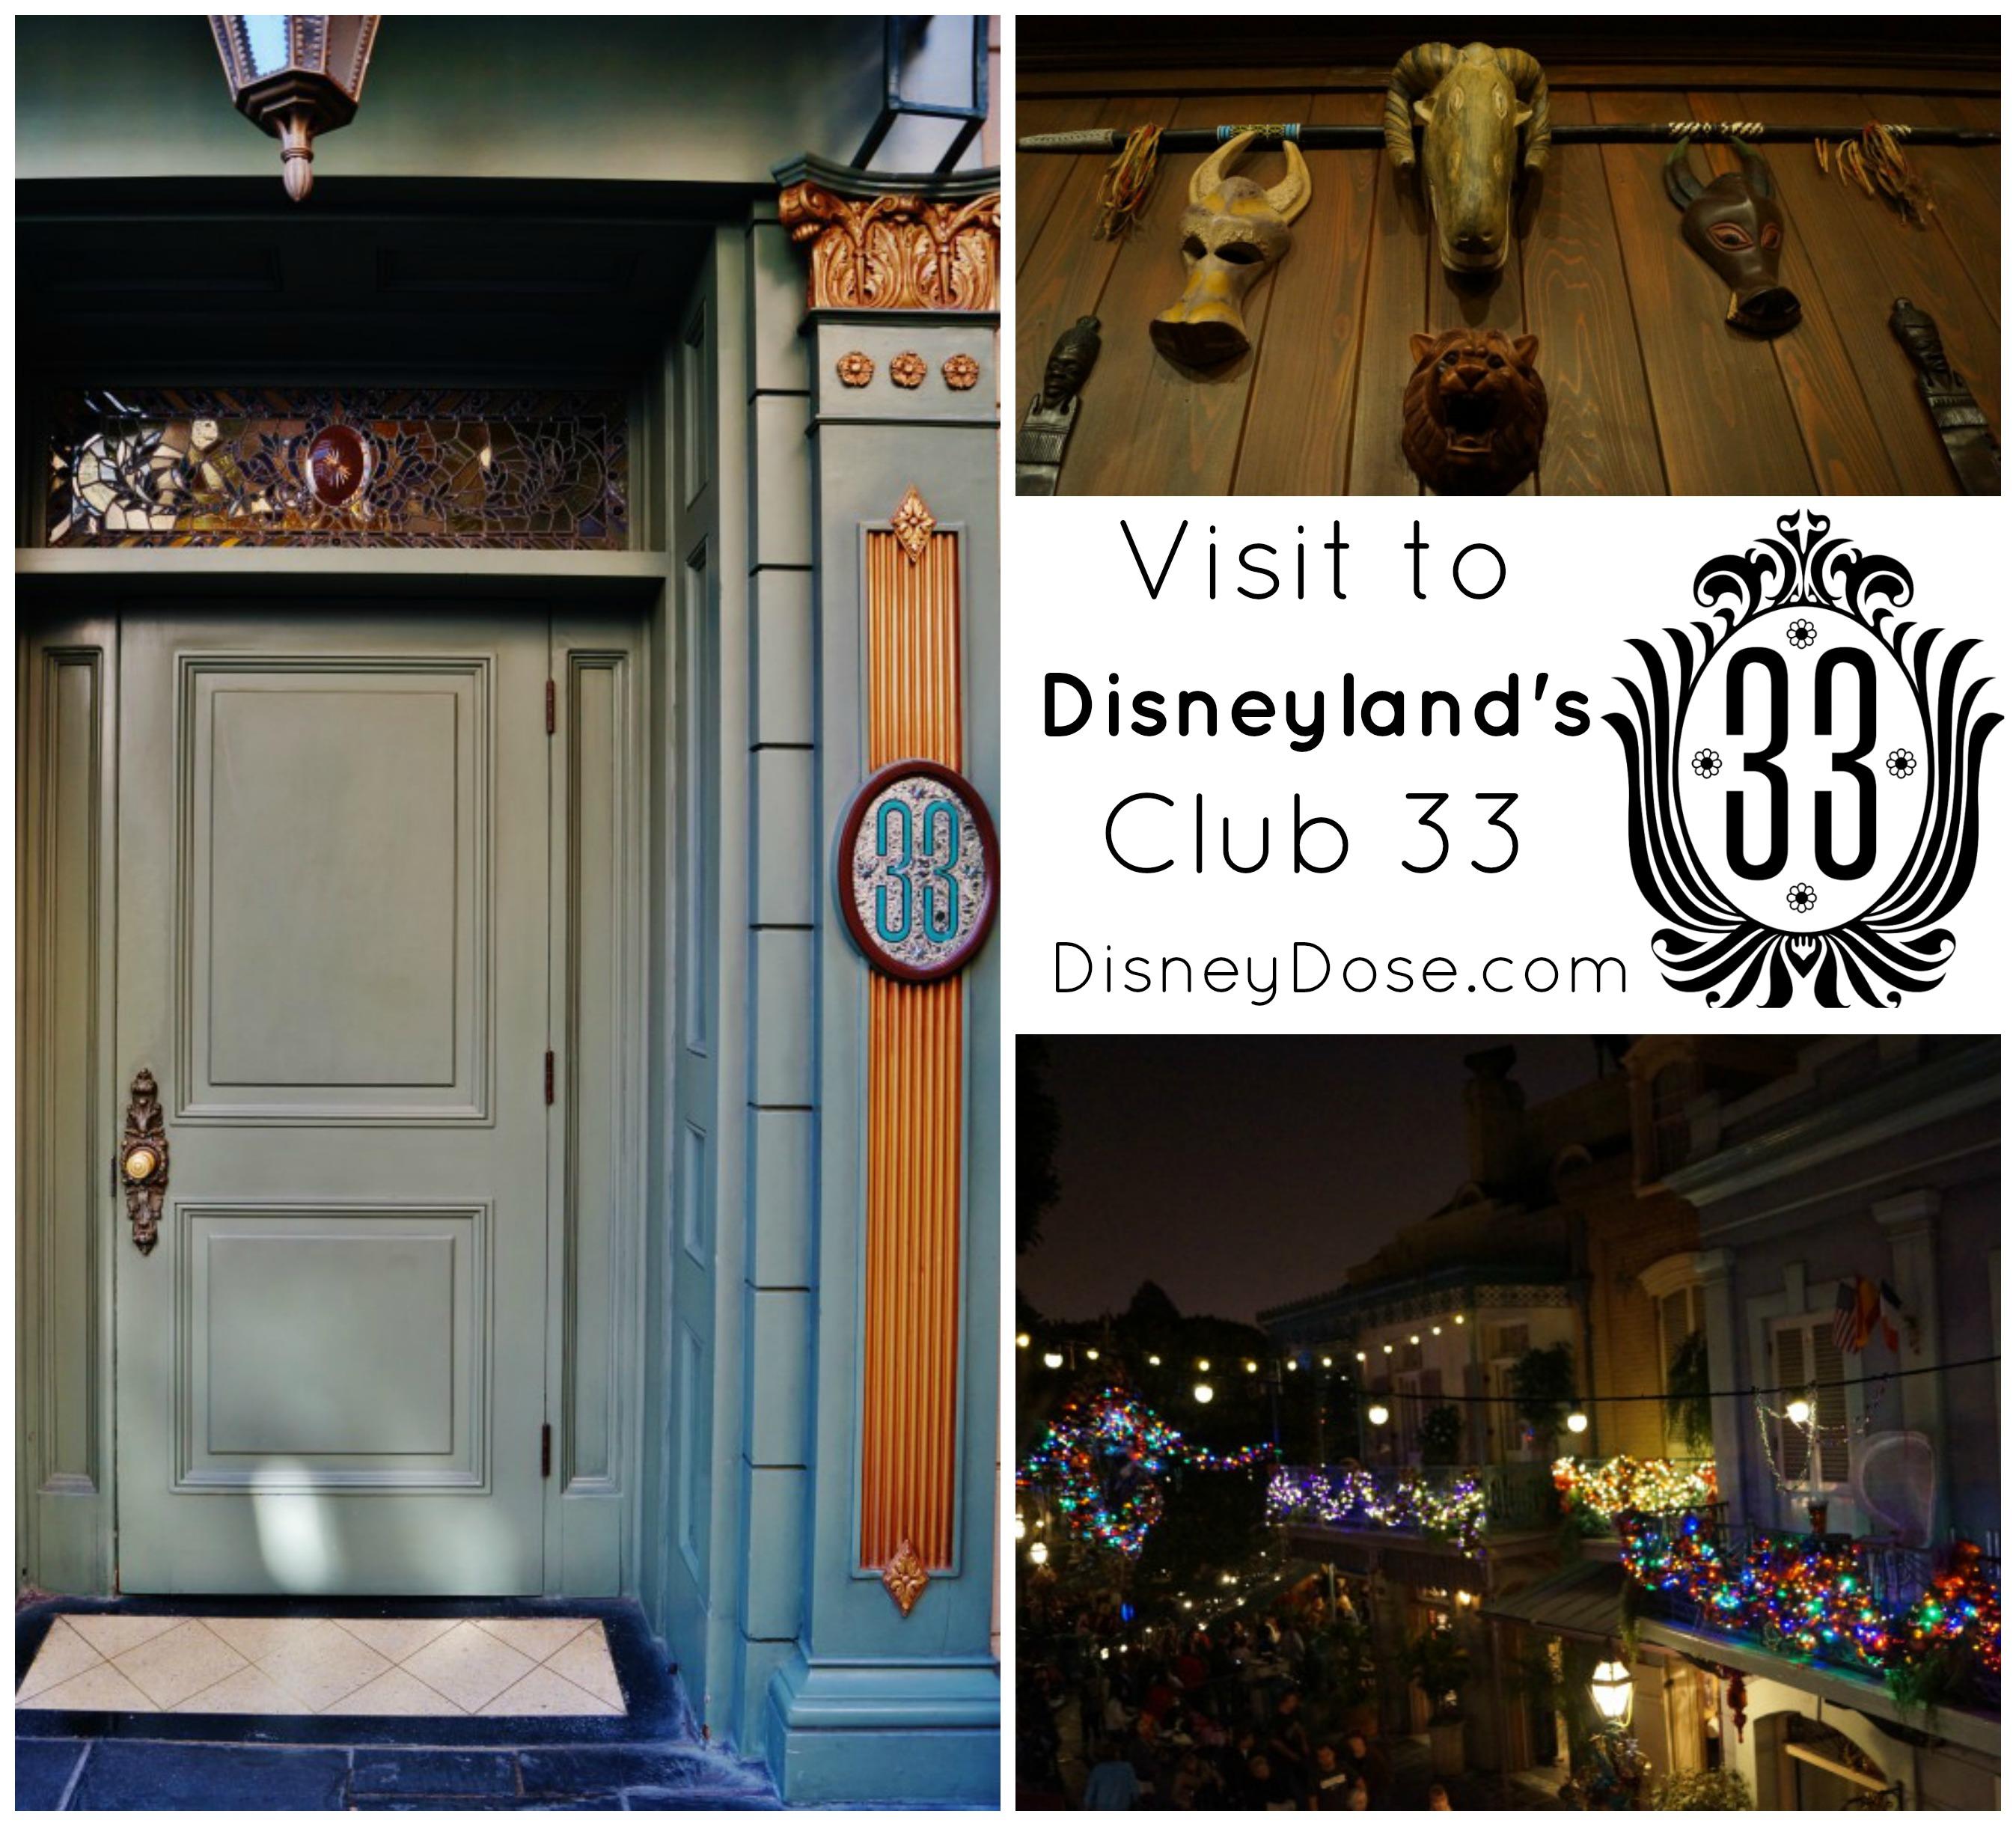 Final Look at Disneylandu0027s Club 33 Before Major Expansion Adding Jazz Club - Disney Dose & Final Look at Disneylandu0027s Club 33 Before Major Expansion Adding ...